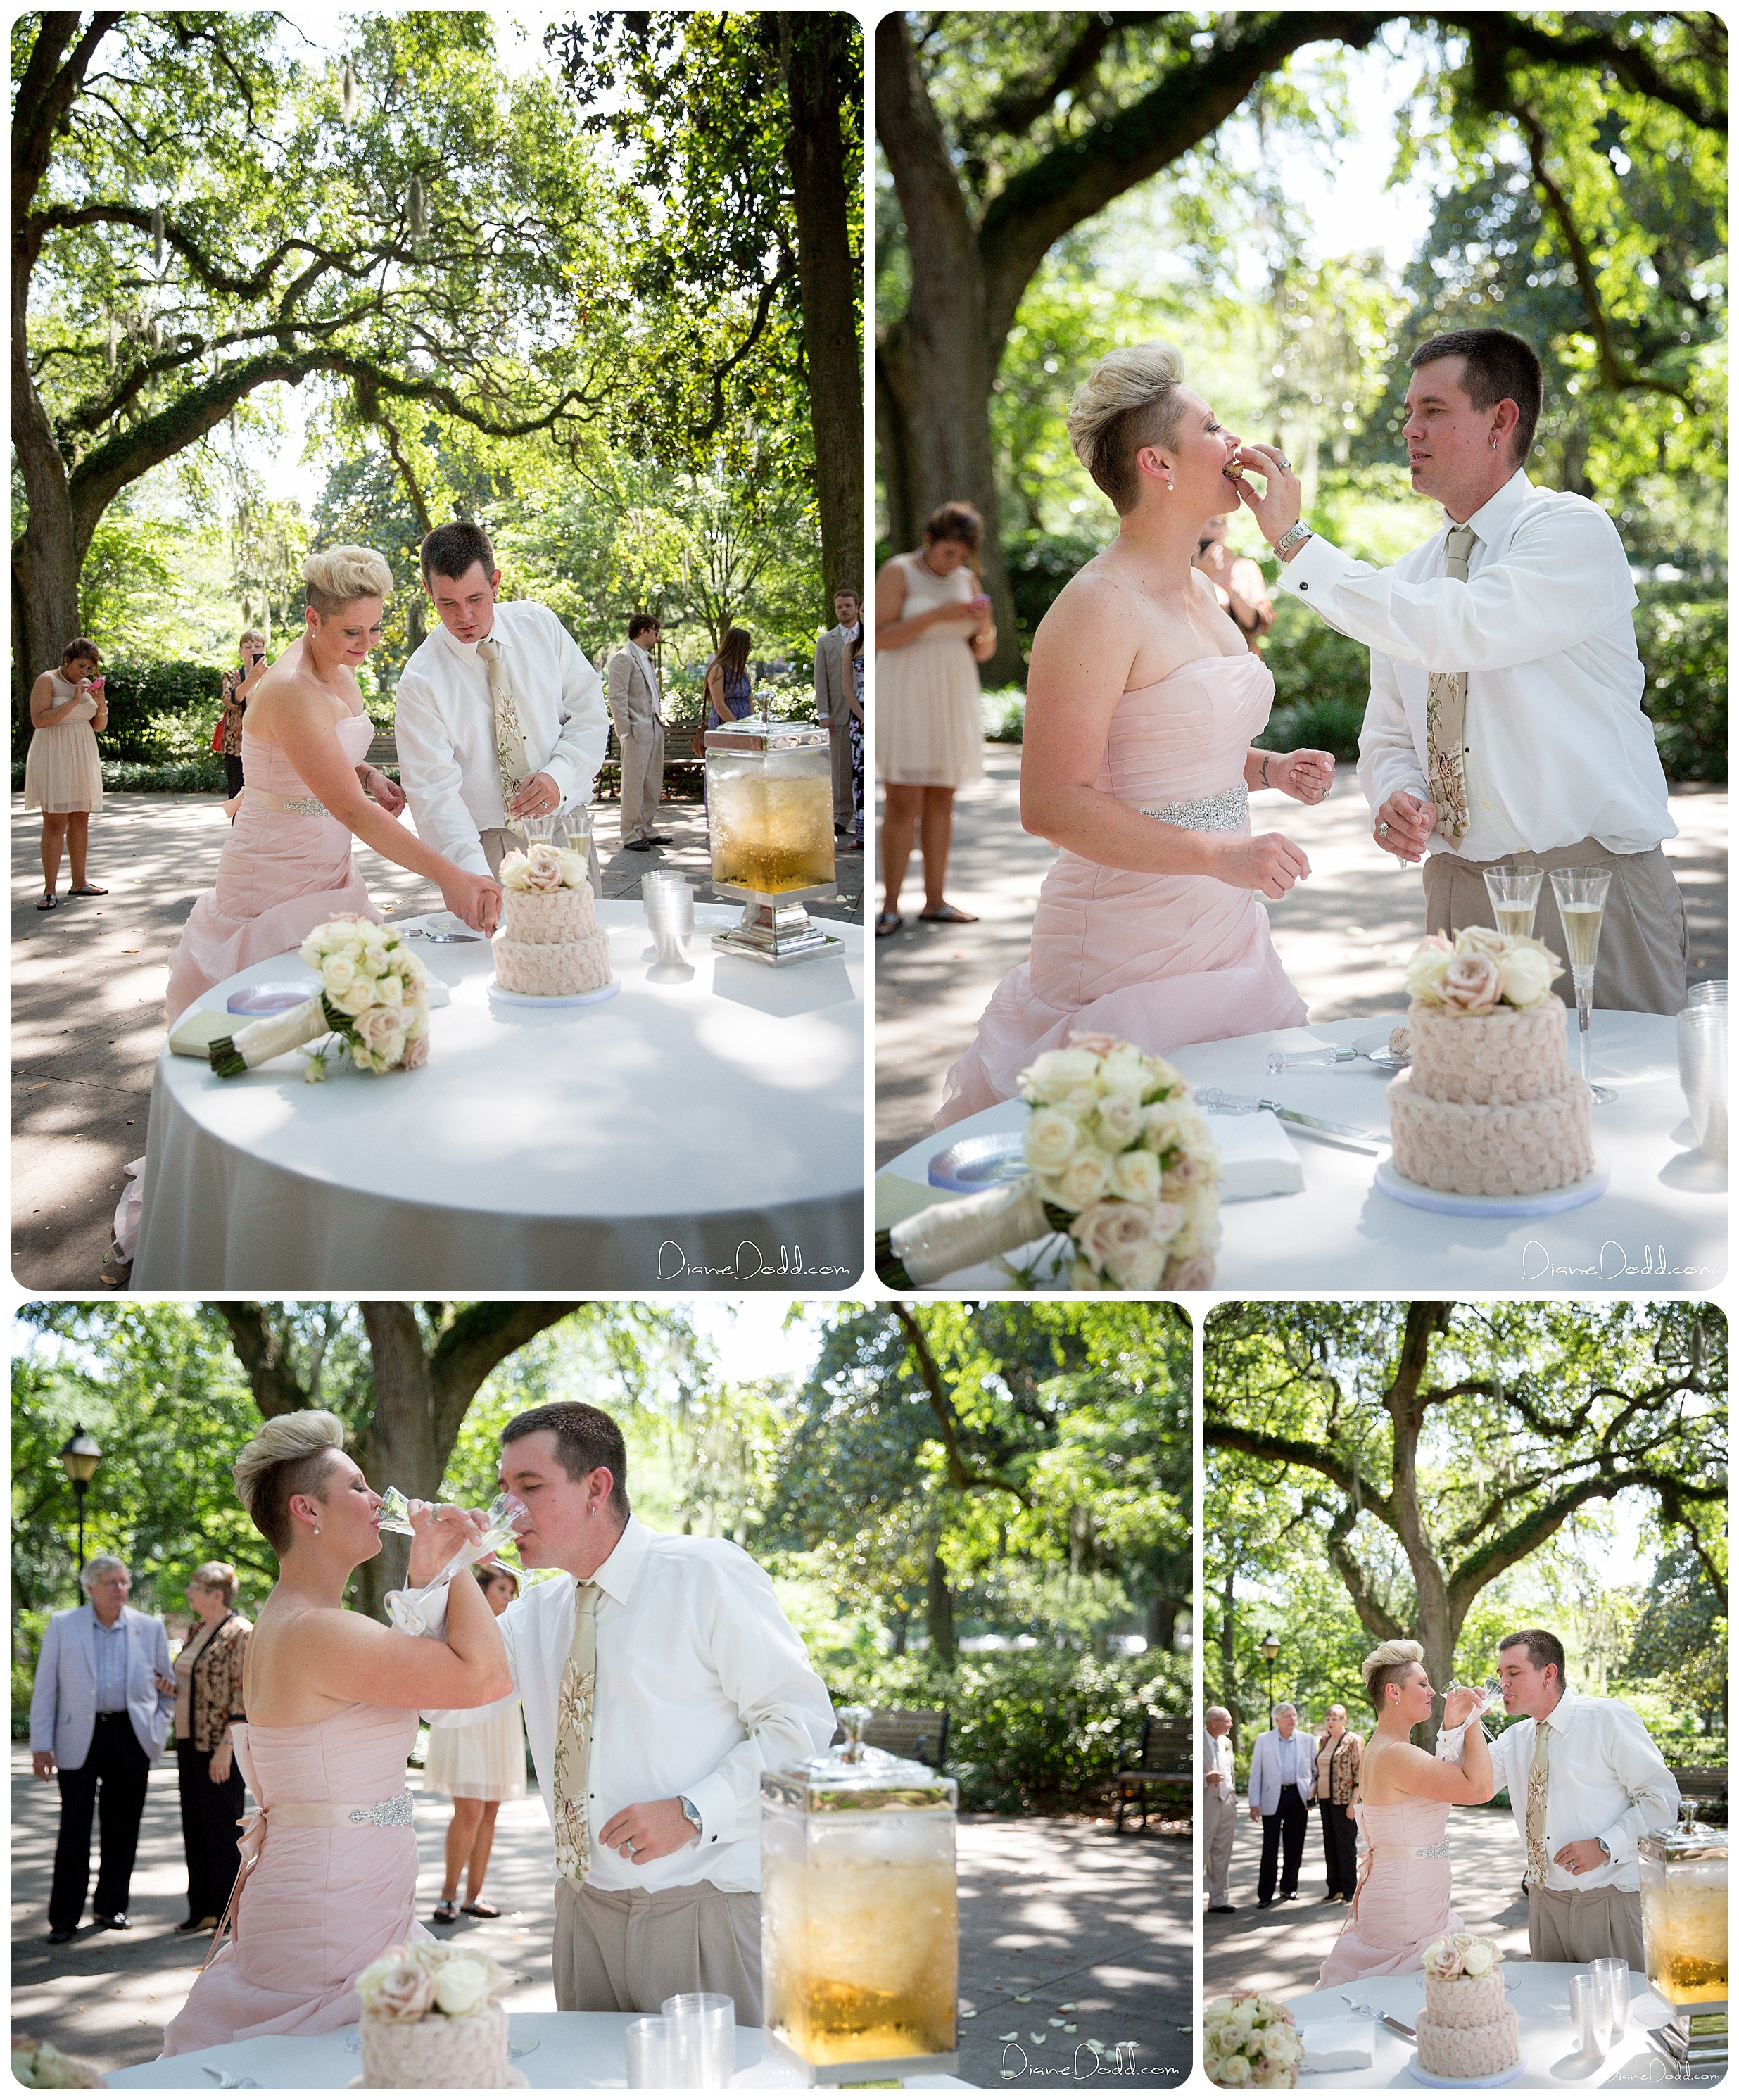 savannah-elopement-photography-200.jpg